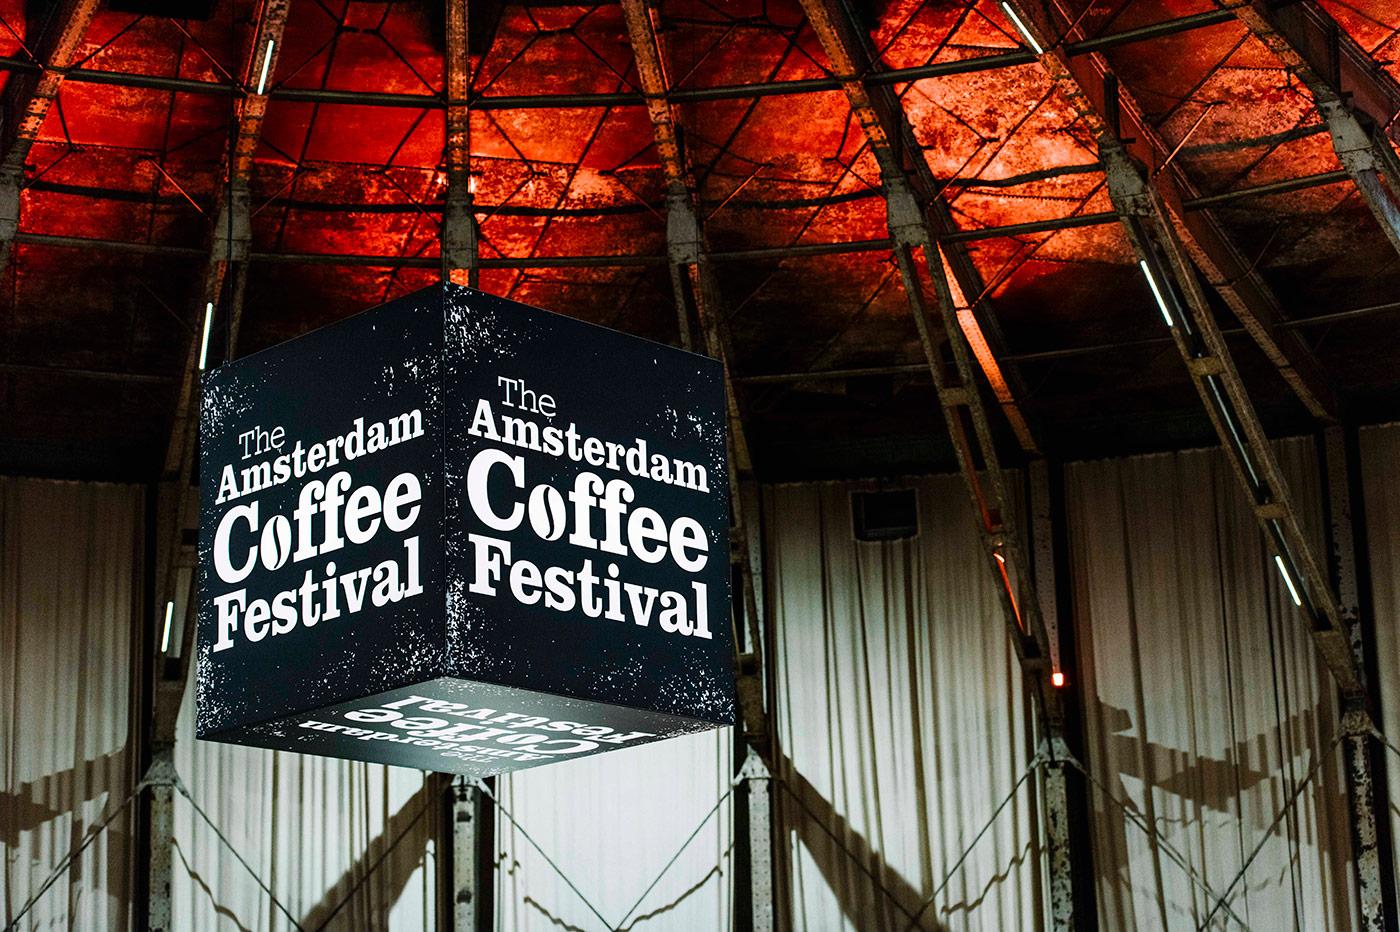 Kaffee-Events, Festival und Kalender: Amsterdam Coffee Festival. CafCaf – Kaffee & Blog, Kaffeeblog